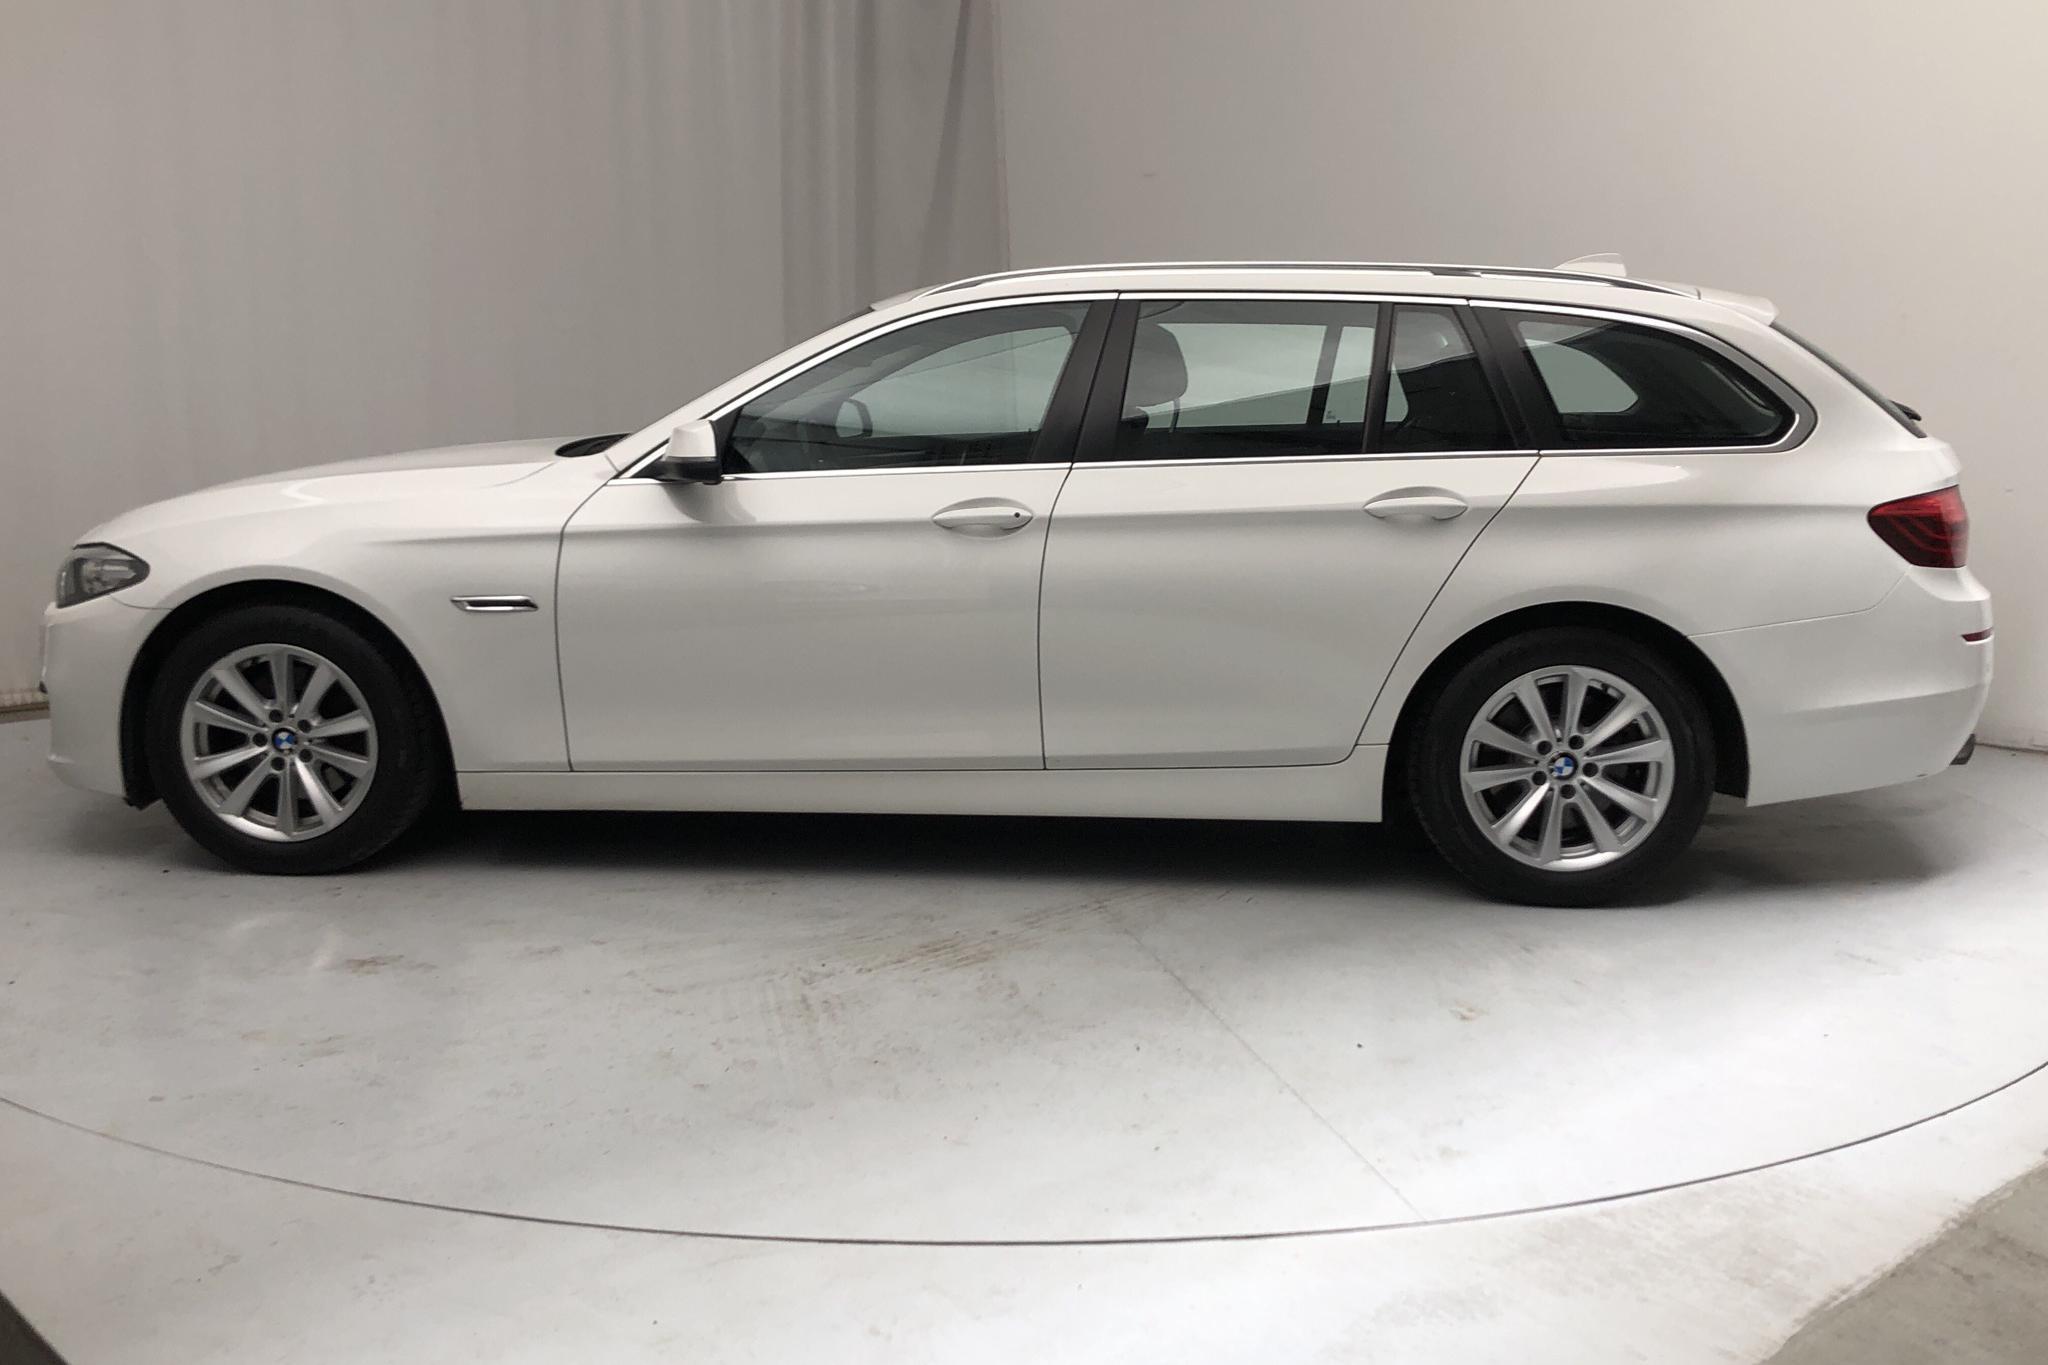 BMW 520d Touring, F11 (184hk) - 164 630 km - Automatic - white - 2014